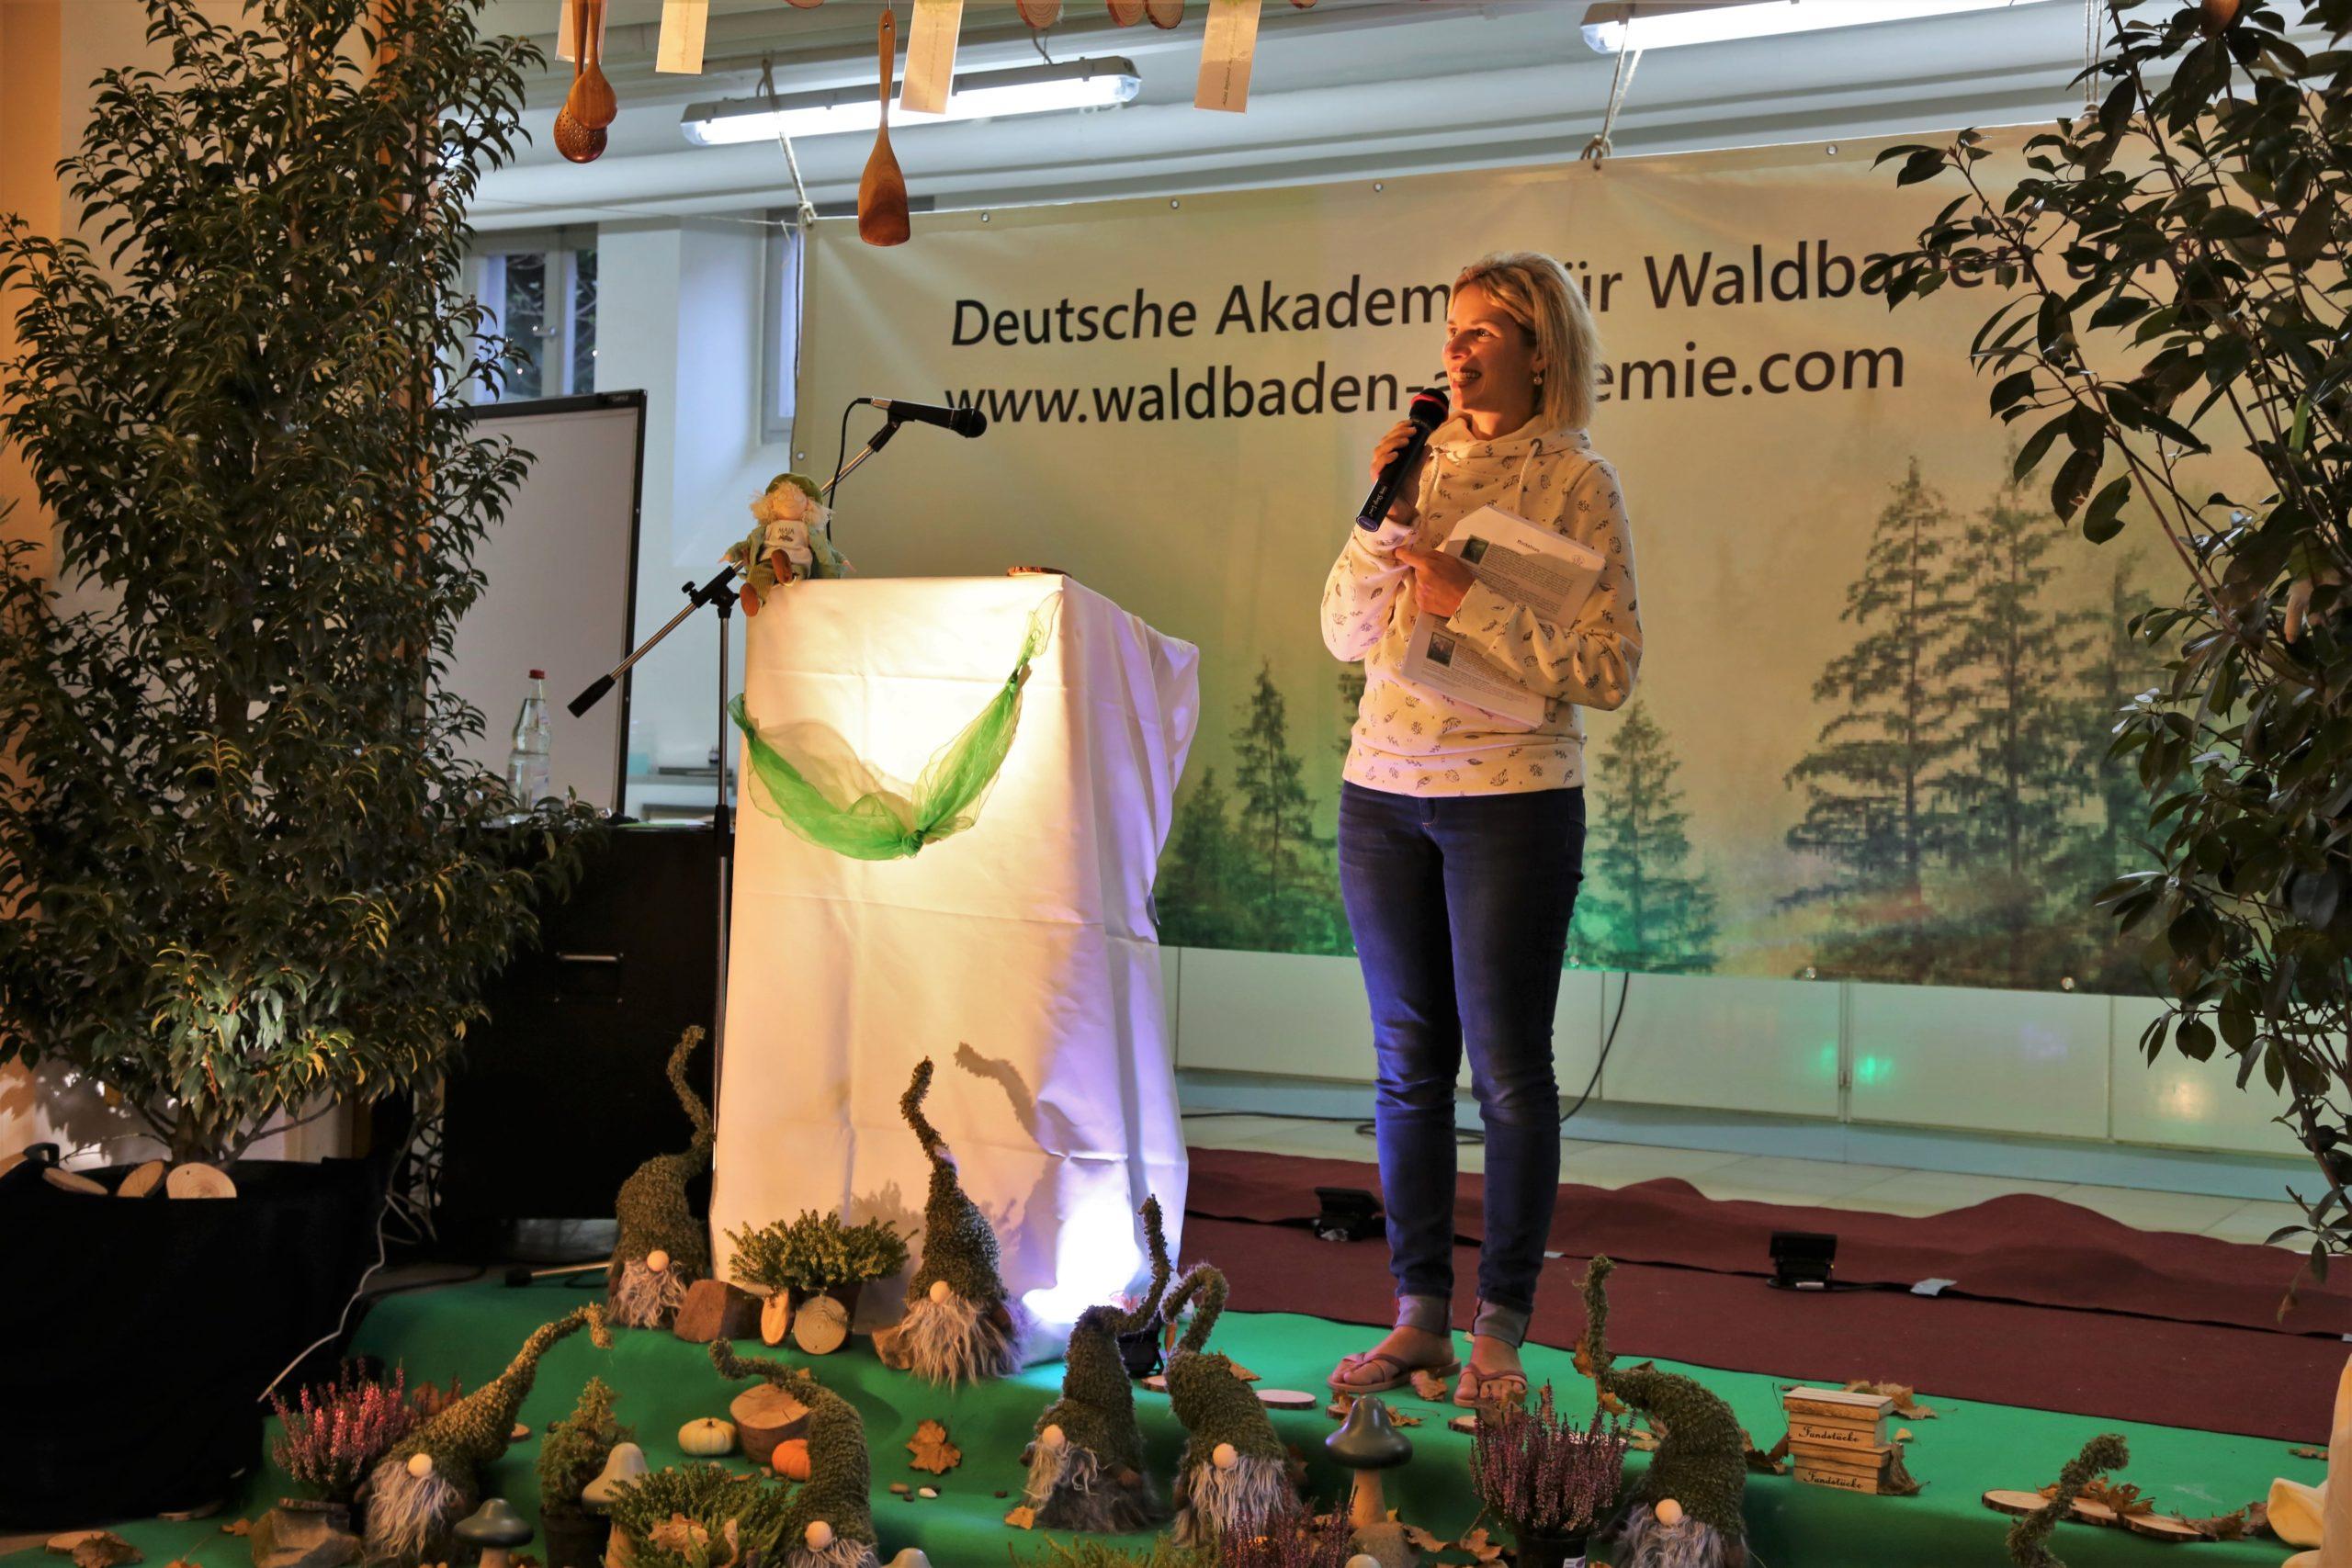 kongress-2019_Esthal-waldbaden